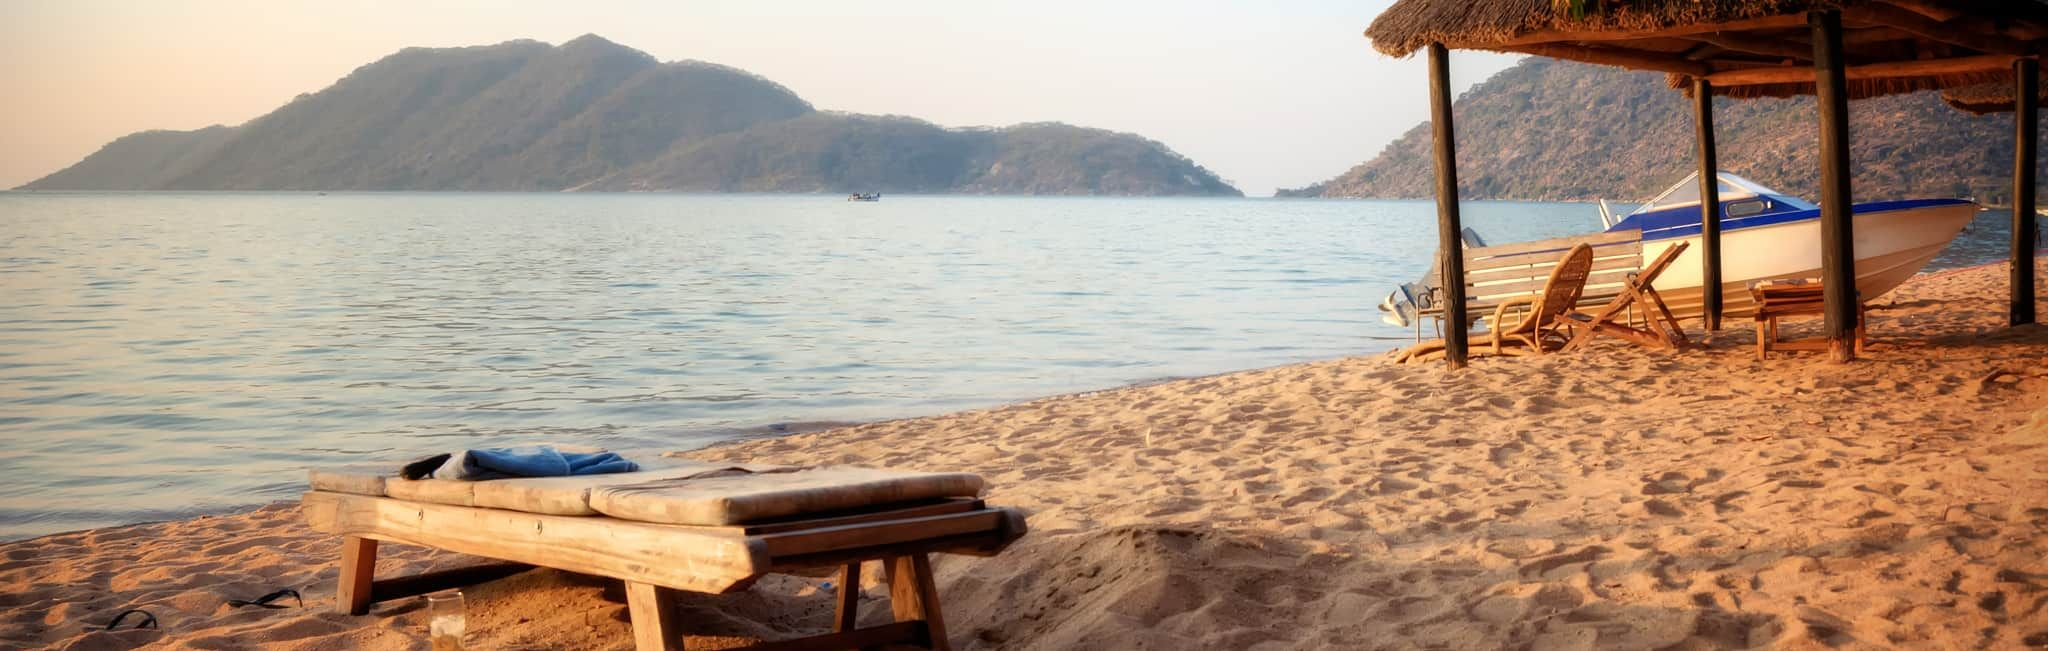 Relaxing on the beach in Monkey Bay, Malawi.